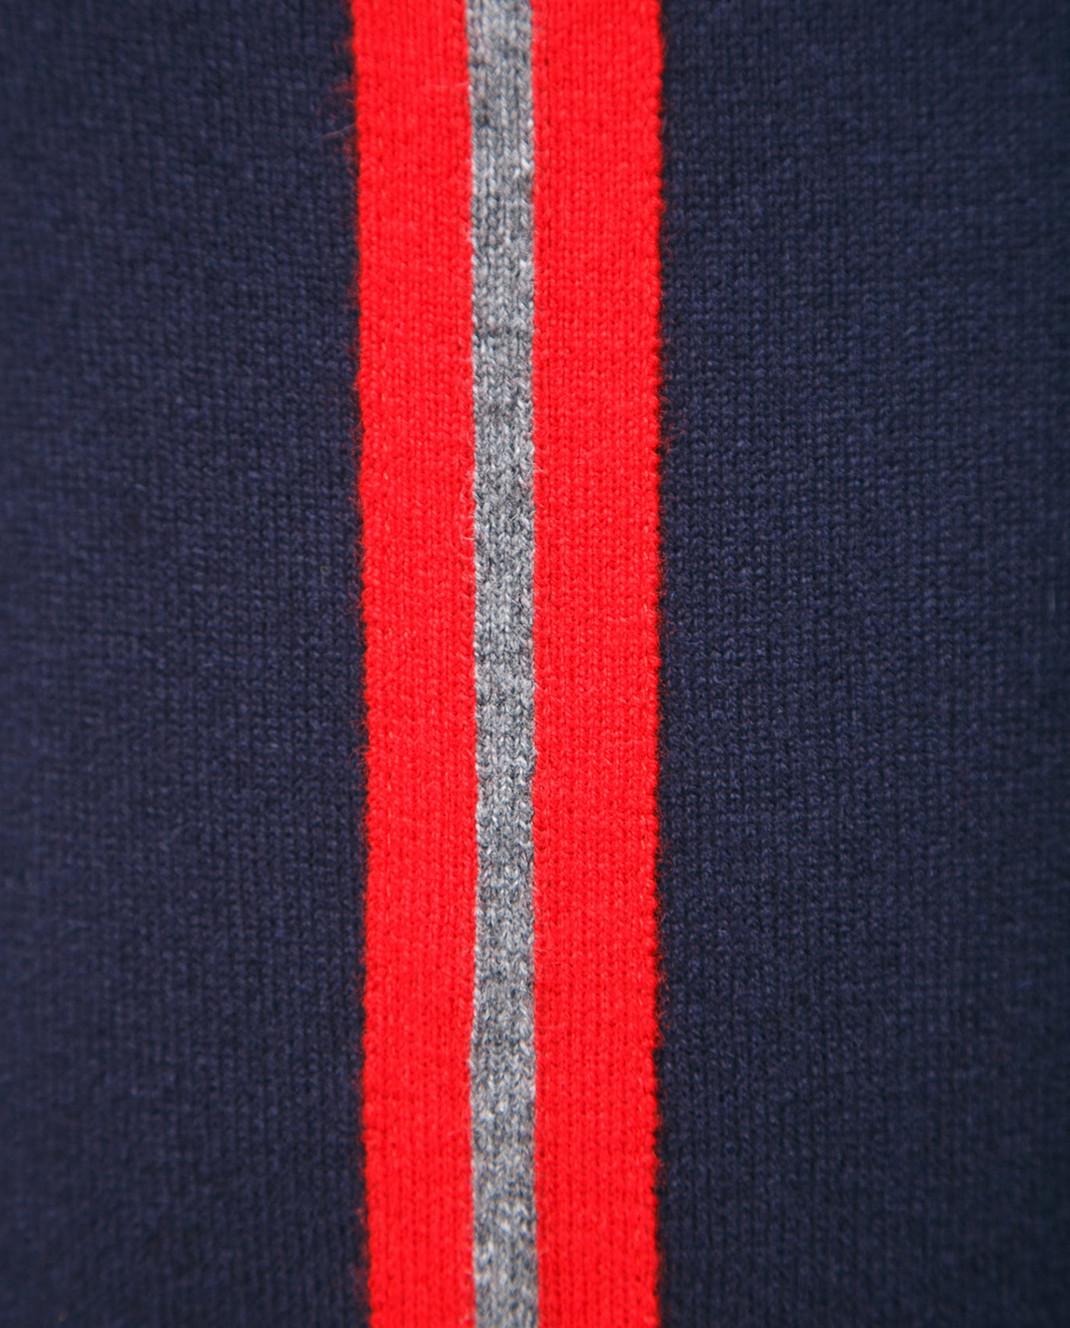 Johnstons Темно-синие брюки из кашемира KAL03898 изображение 3